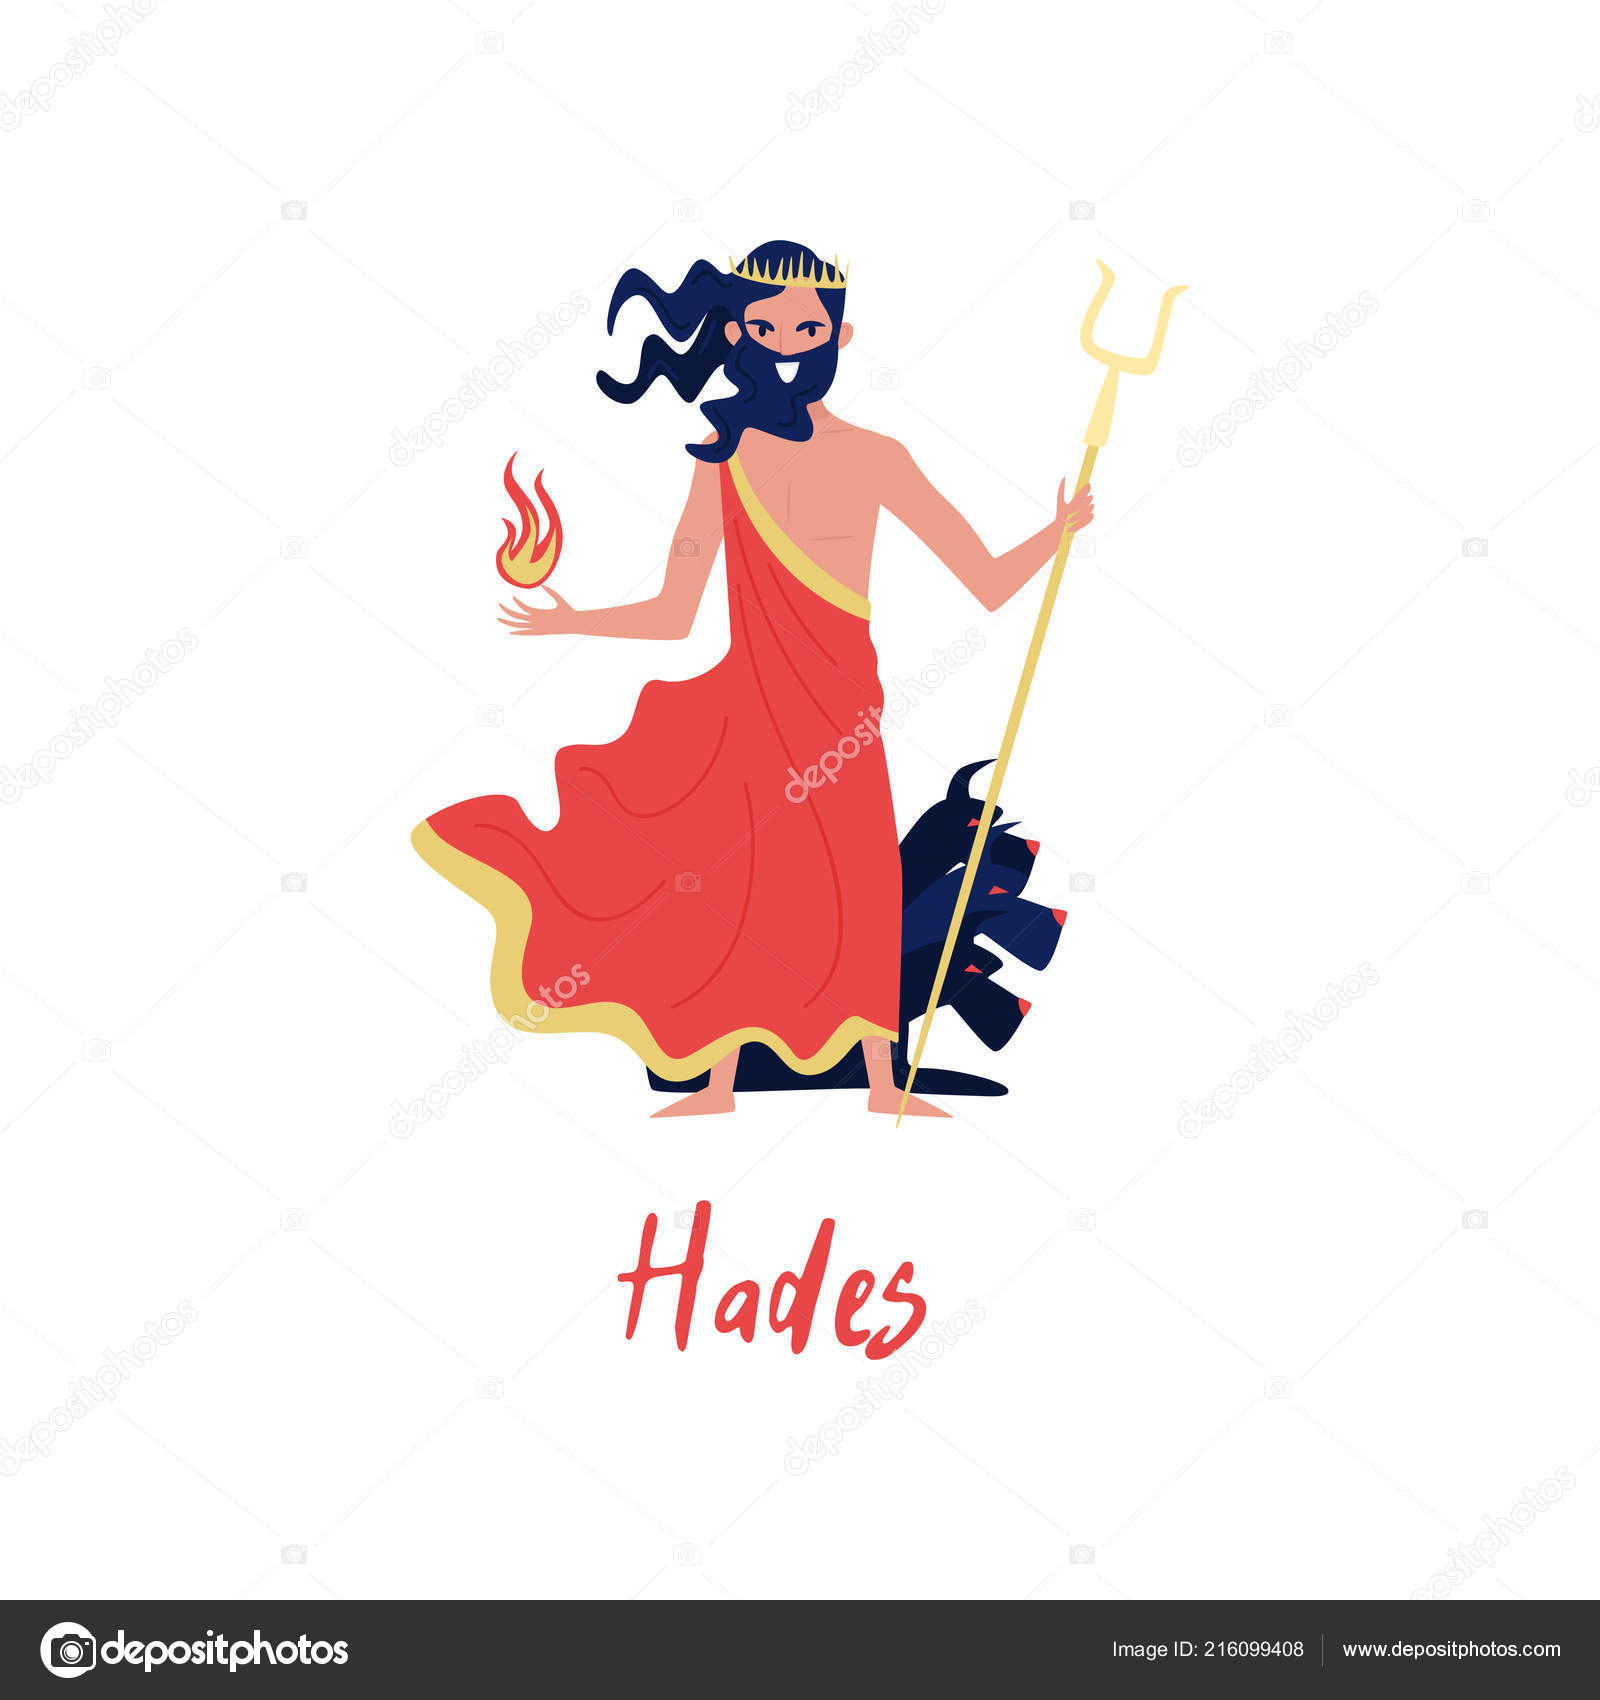 Hades Olympian Greek God Ancient Greece Myths Cartoon Character